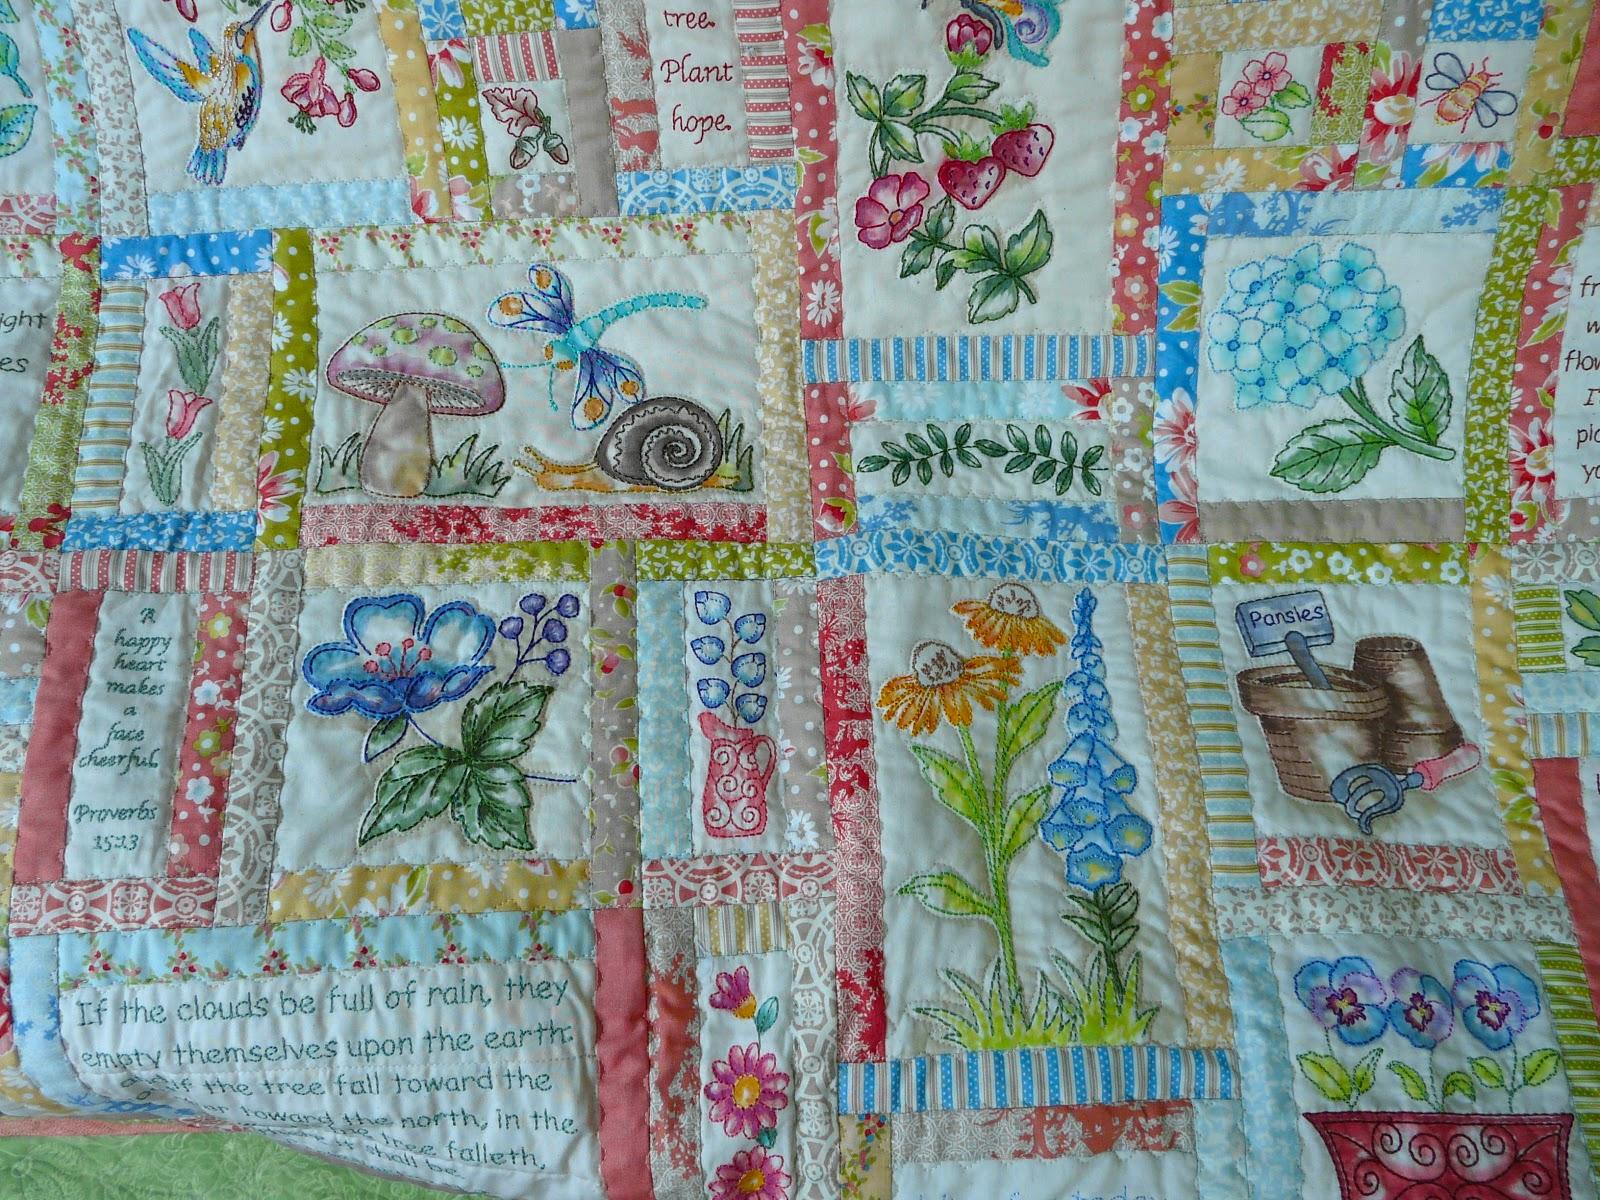 Timber Hill Threads Finished Prayer Garden Quilt